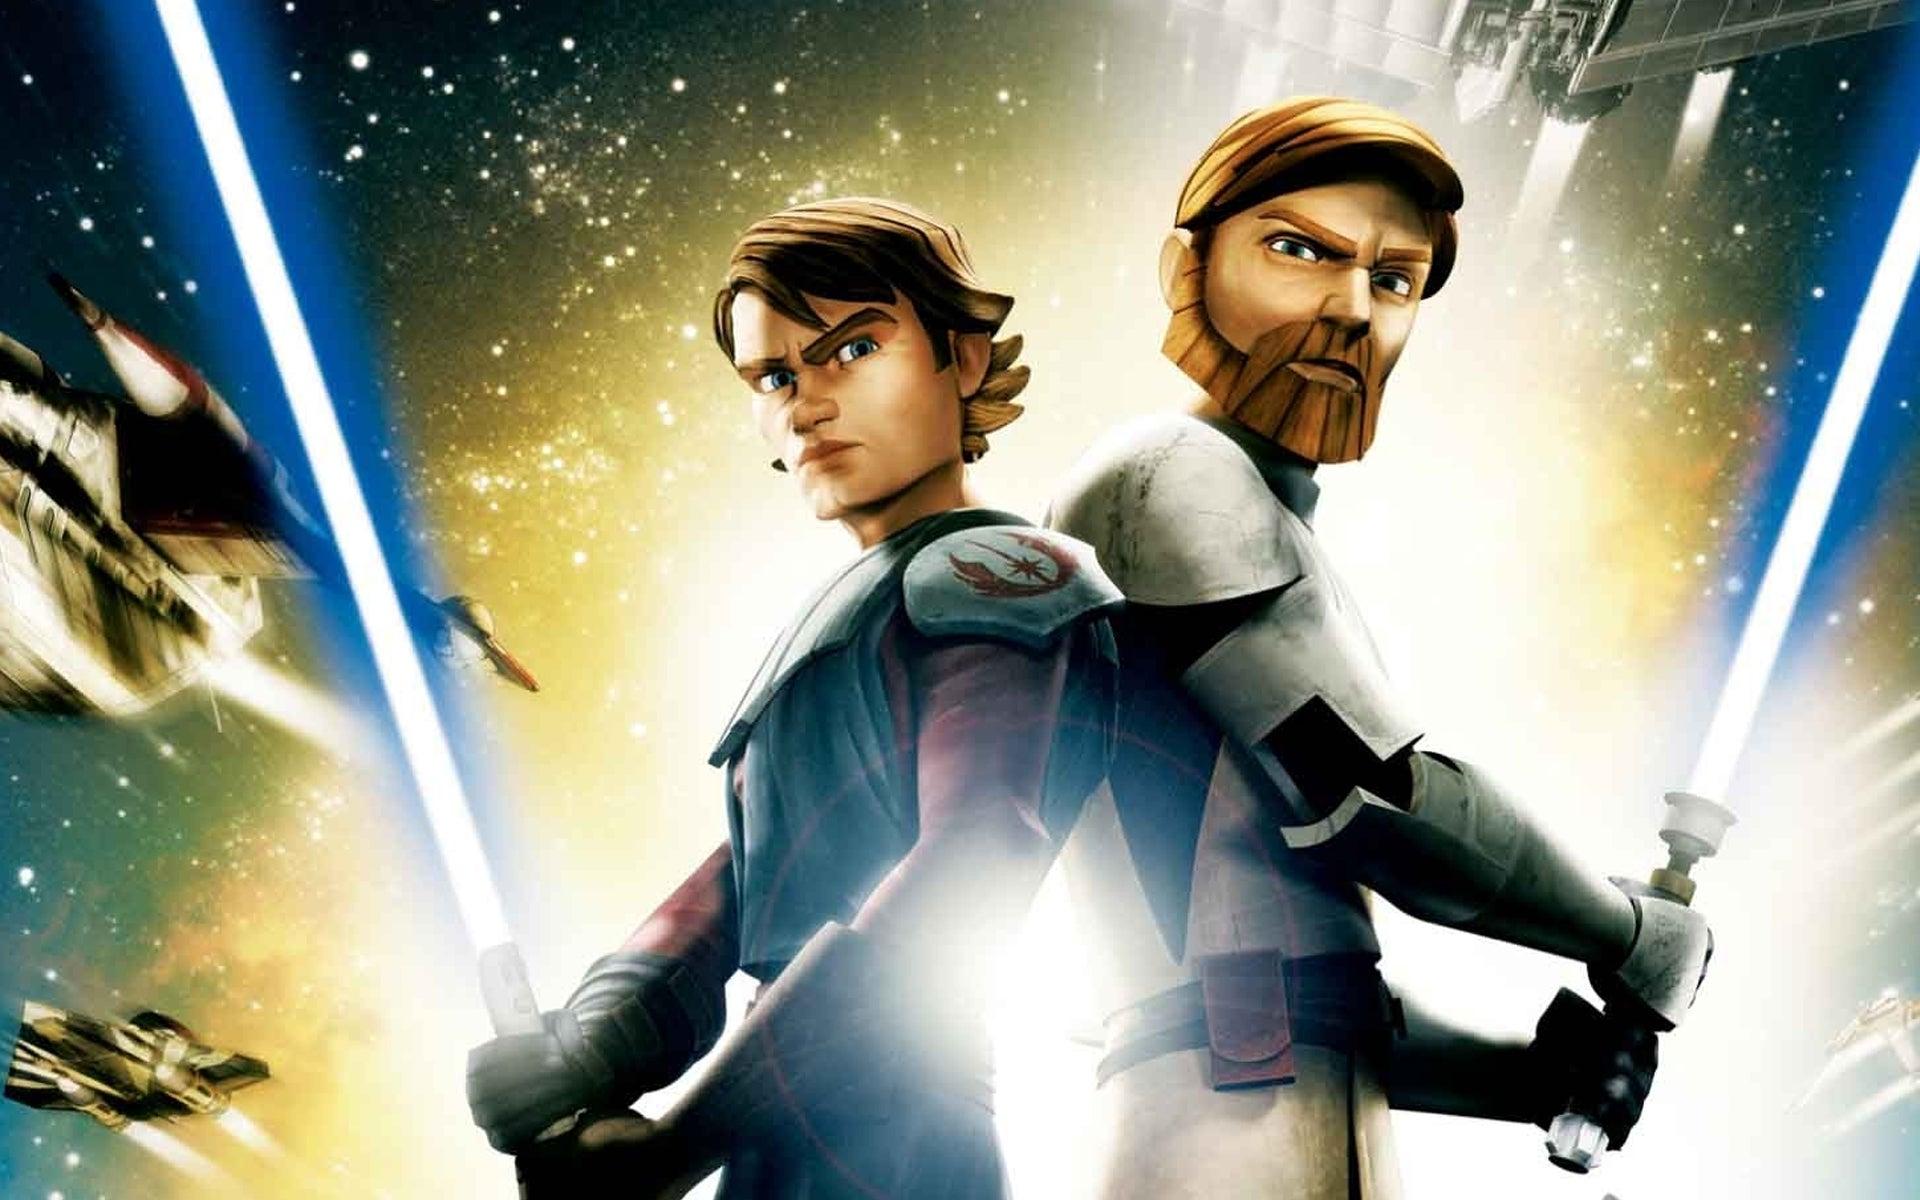 star-wars-clone-wars-obi-wan-kenobi-anakin-skywalker